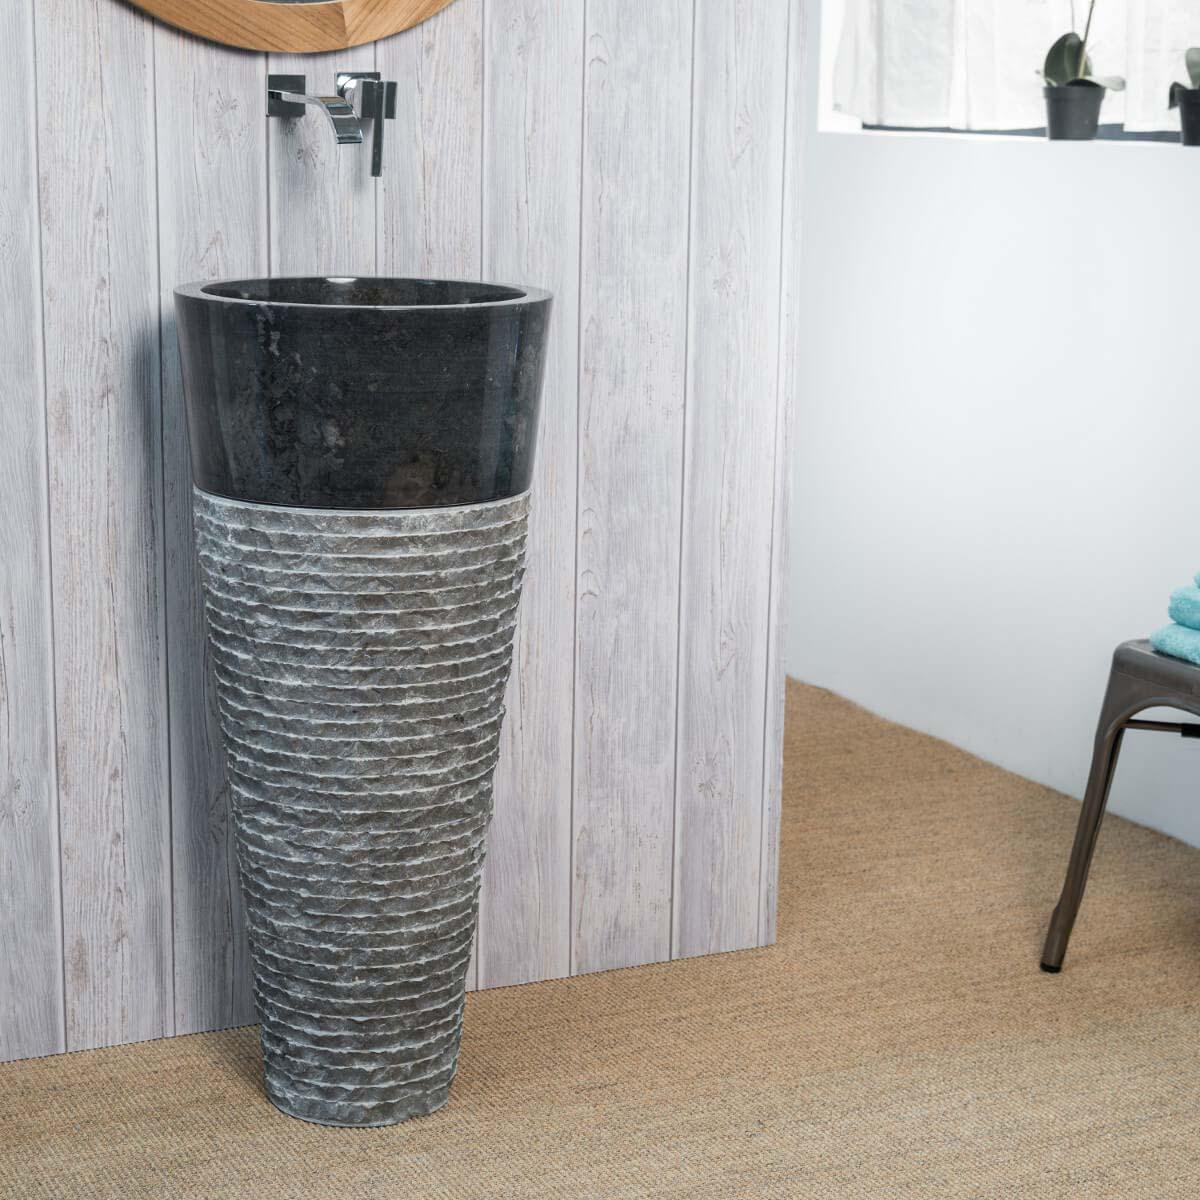 Wanda Collection Vasque salle de bain sur pied en pierre FLORENCE noir